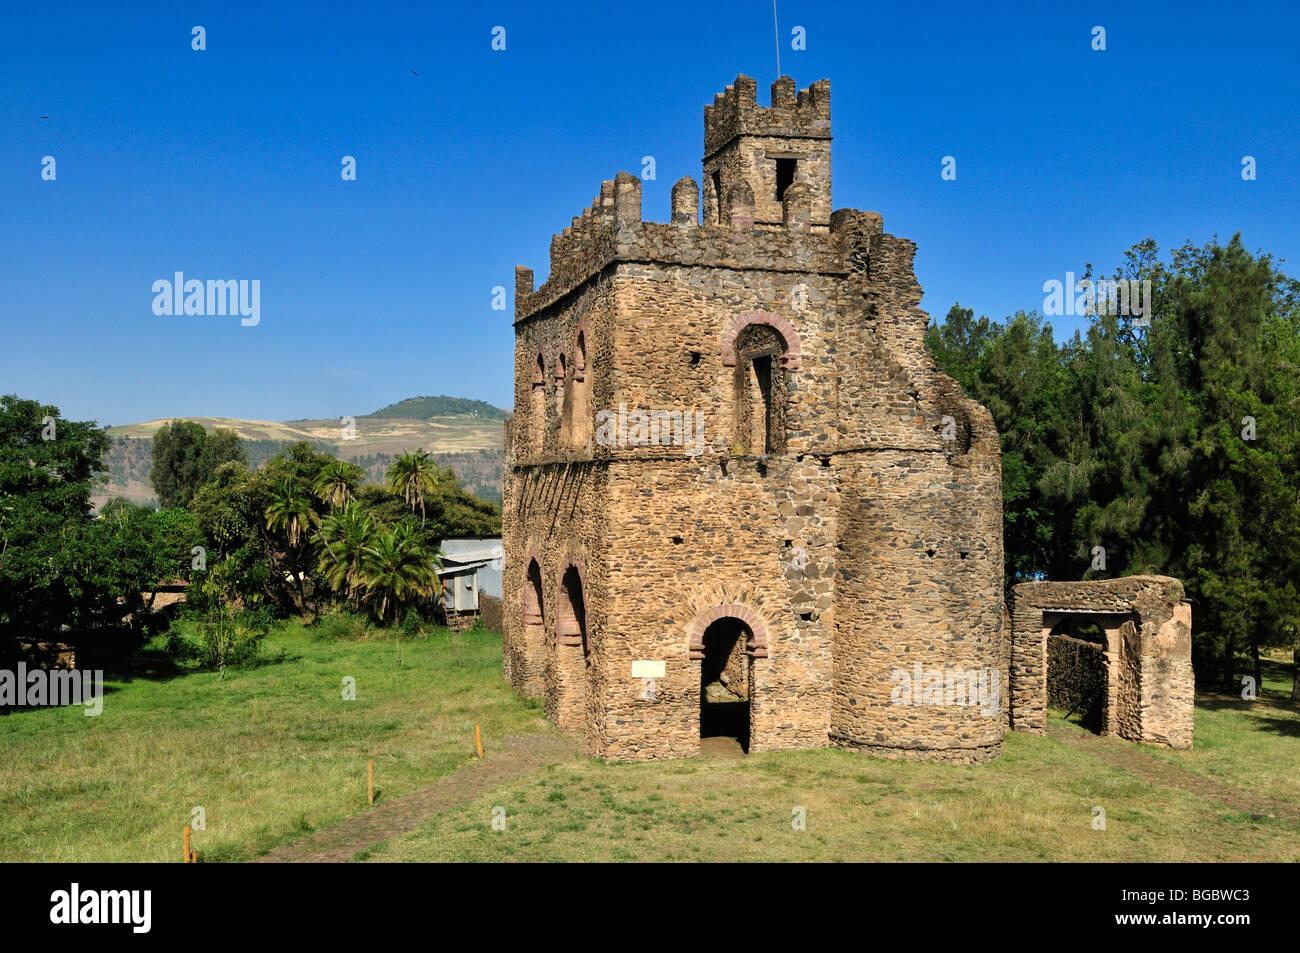 Fasiladas Archive, Royal Enclosure Fasil Ghebbi, UNESCO World Heritage Site, Gonder, Gondar, Amhara, Ethiopia, Africa - Stock Image